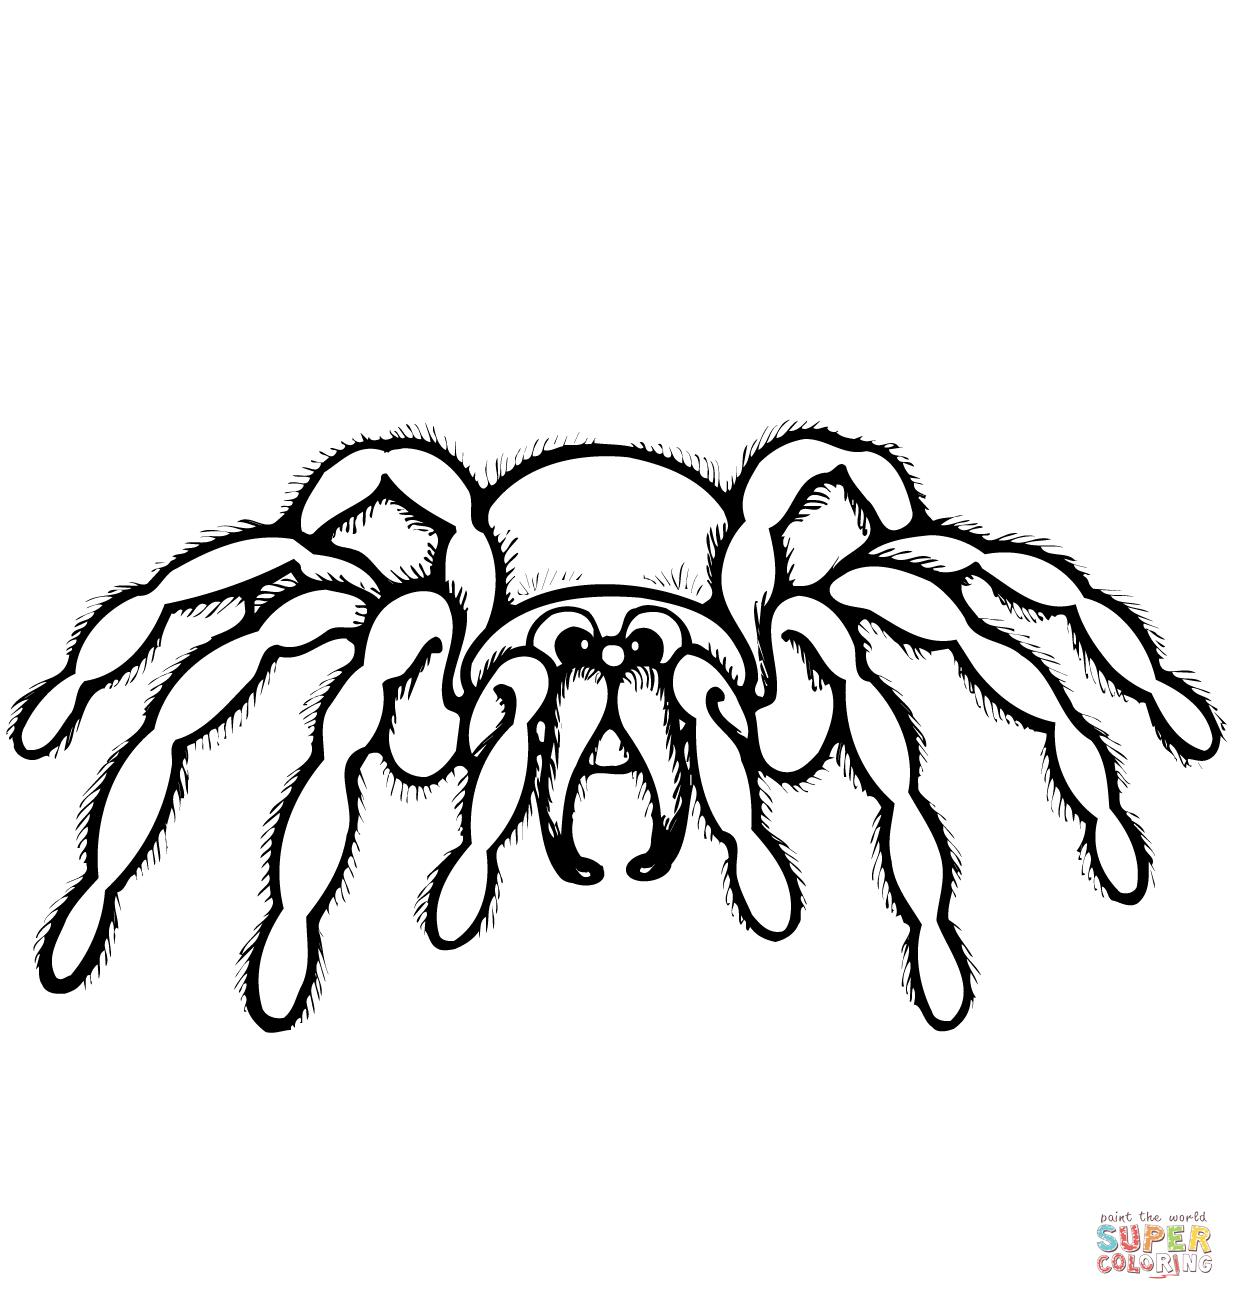 1545183392_cartoon-spider-coloring-page